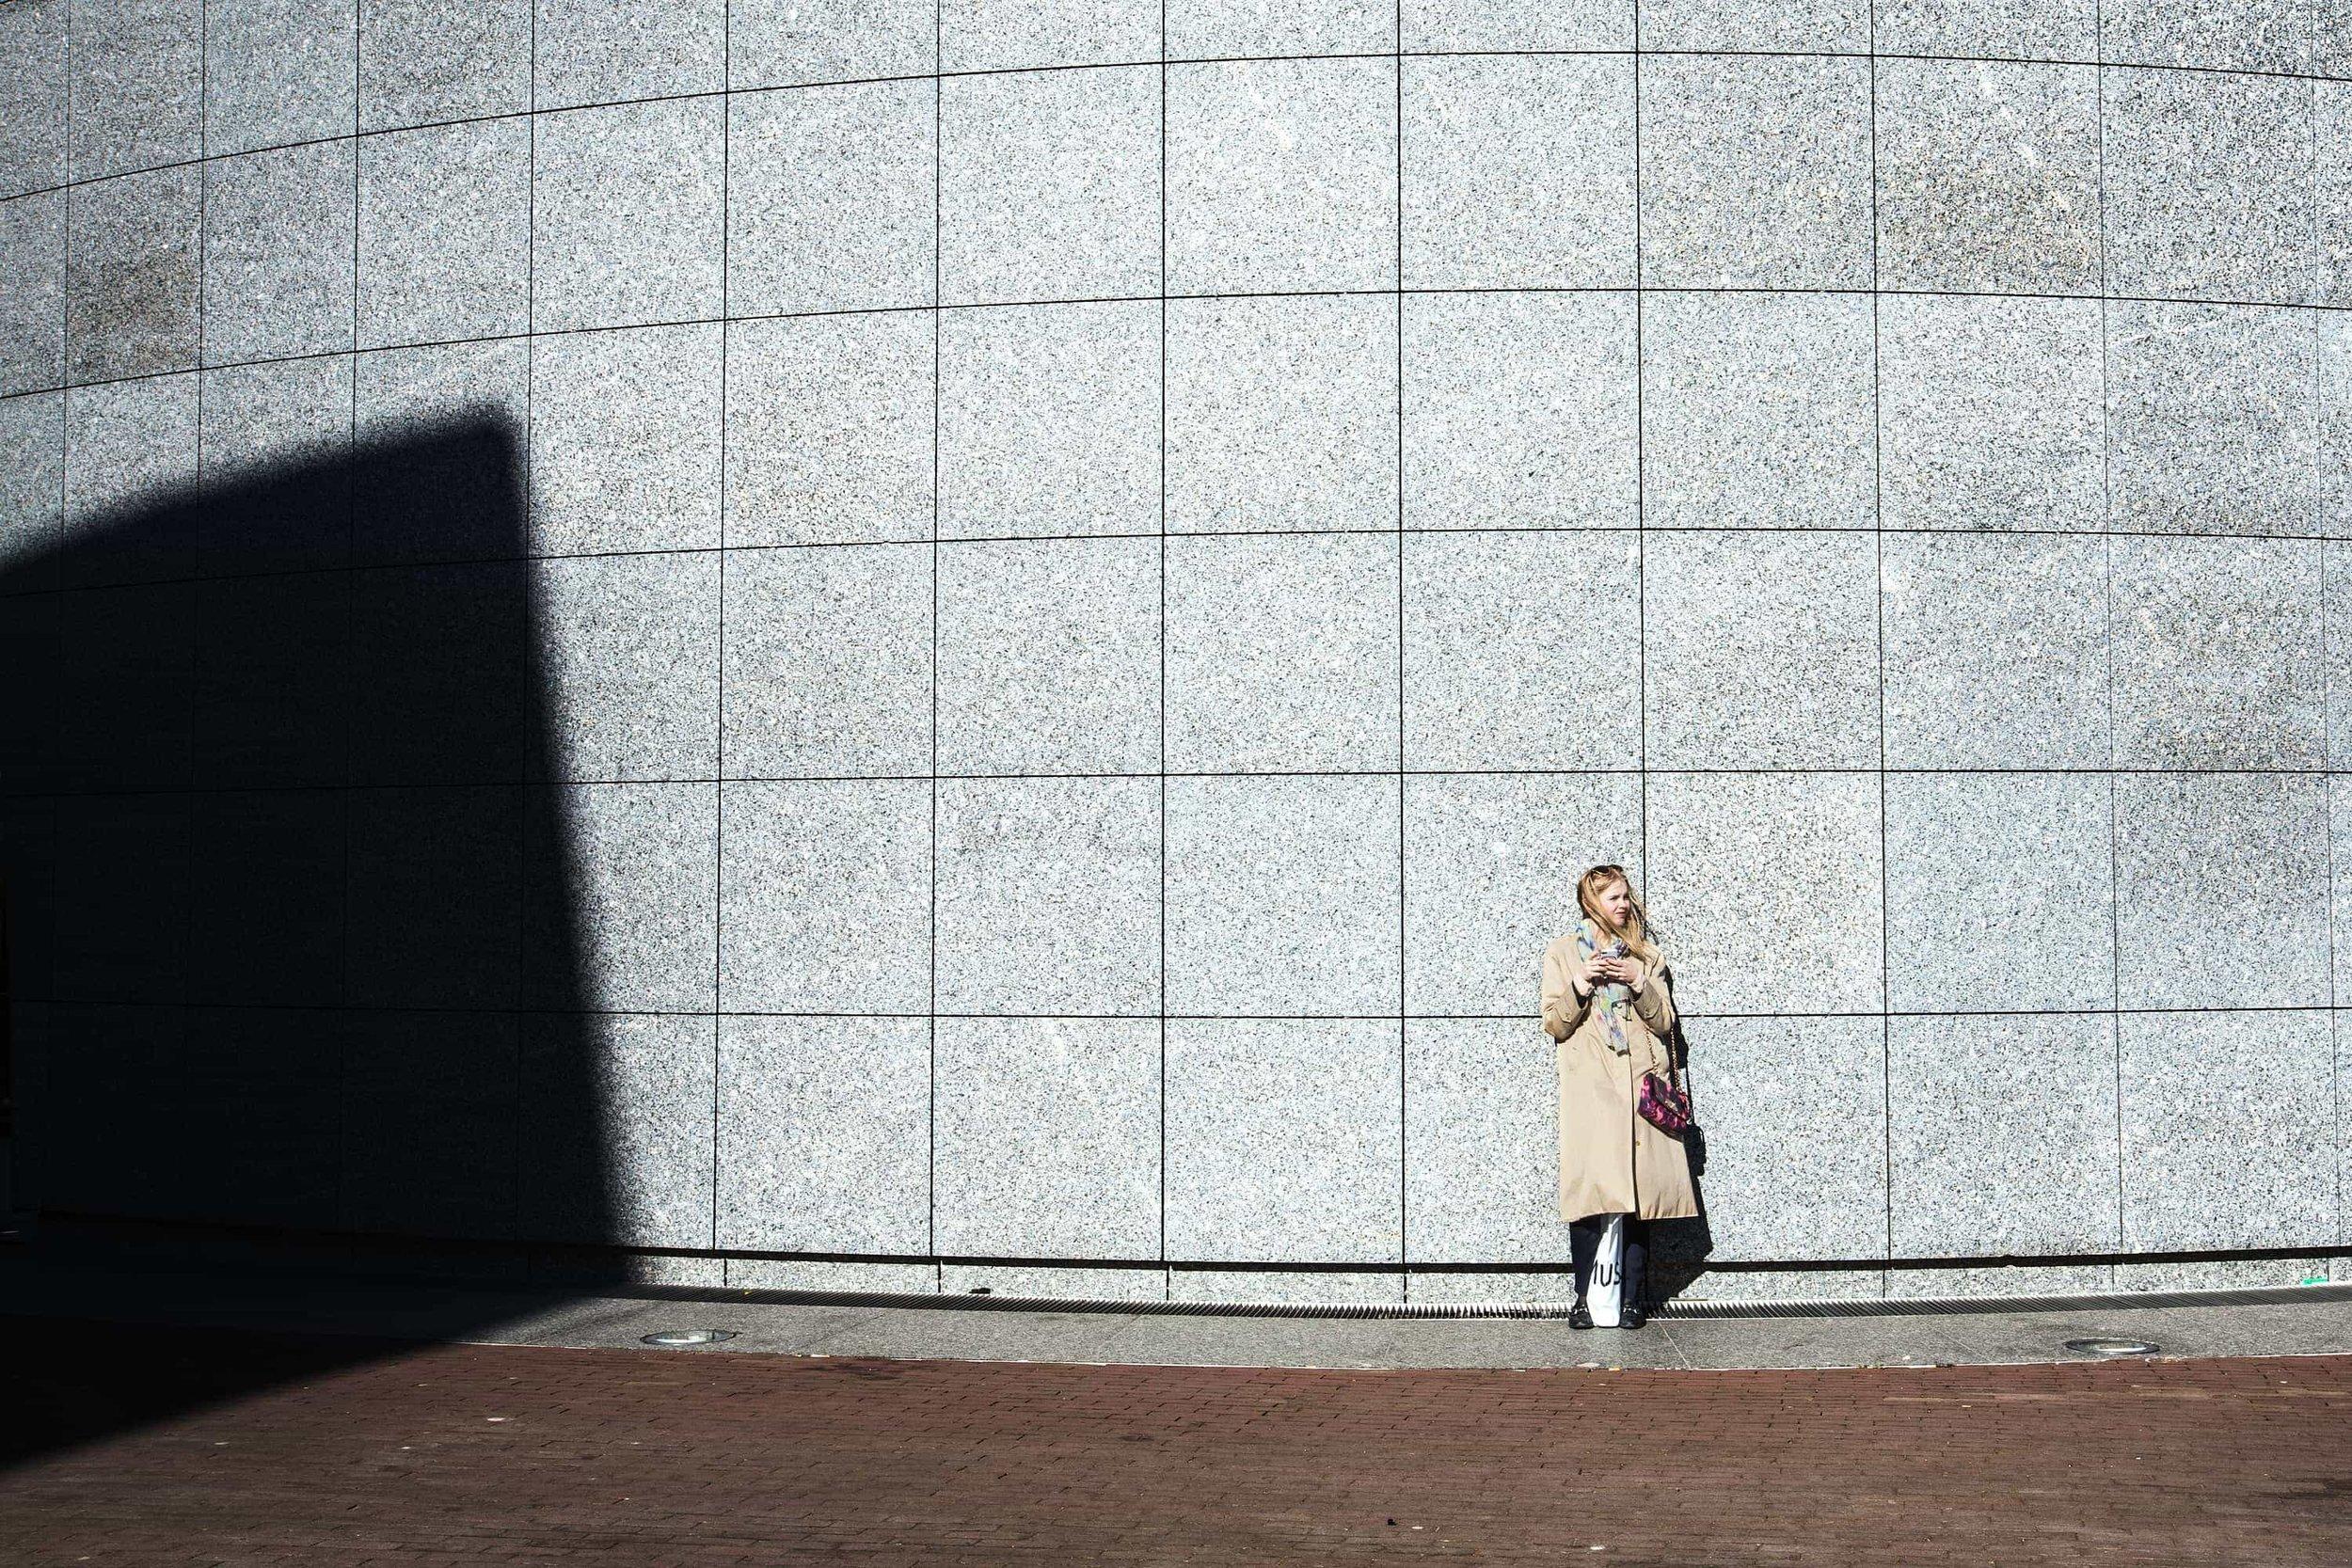 street-documentary-photography-fabio-burrelli-10.jpg